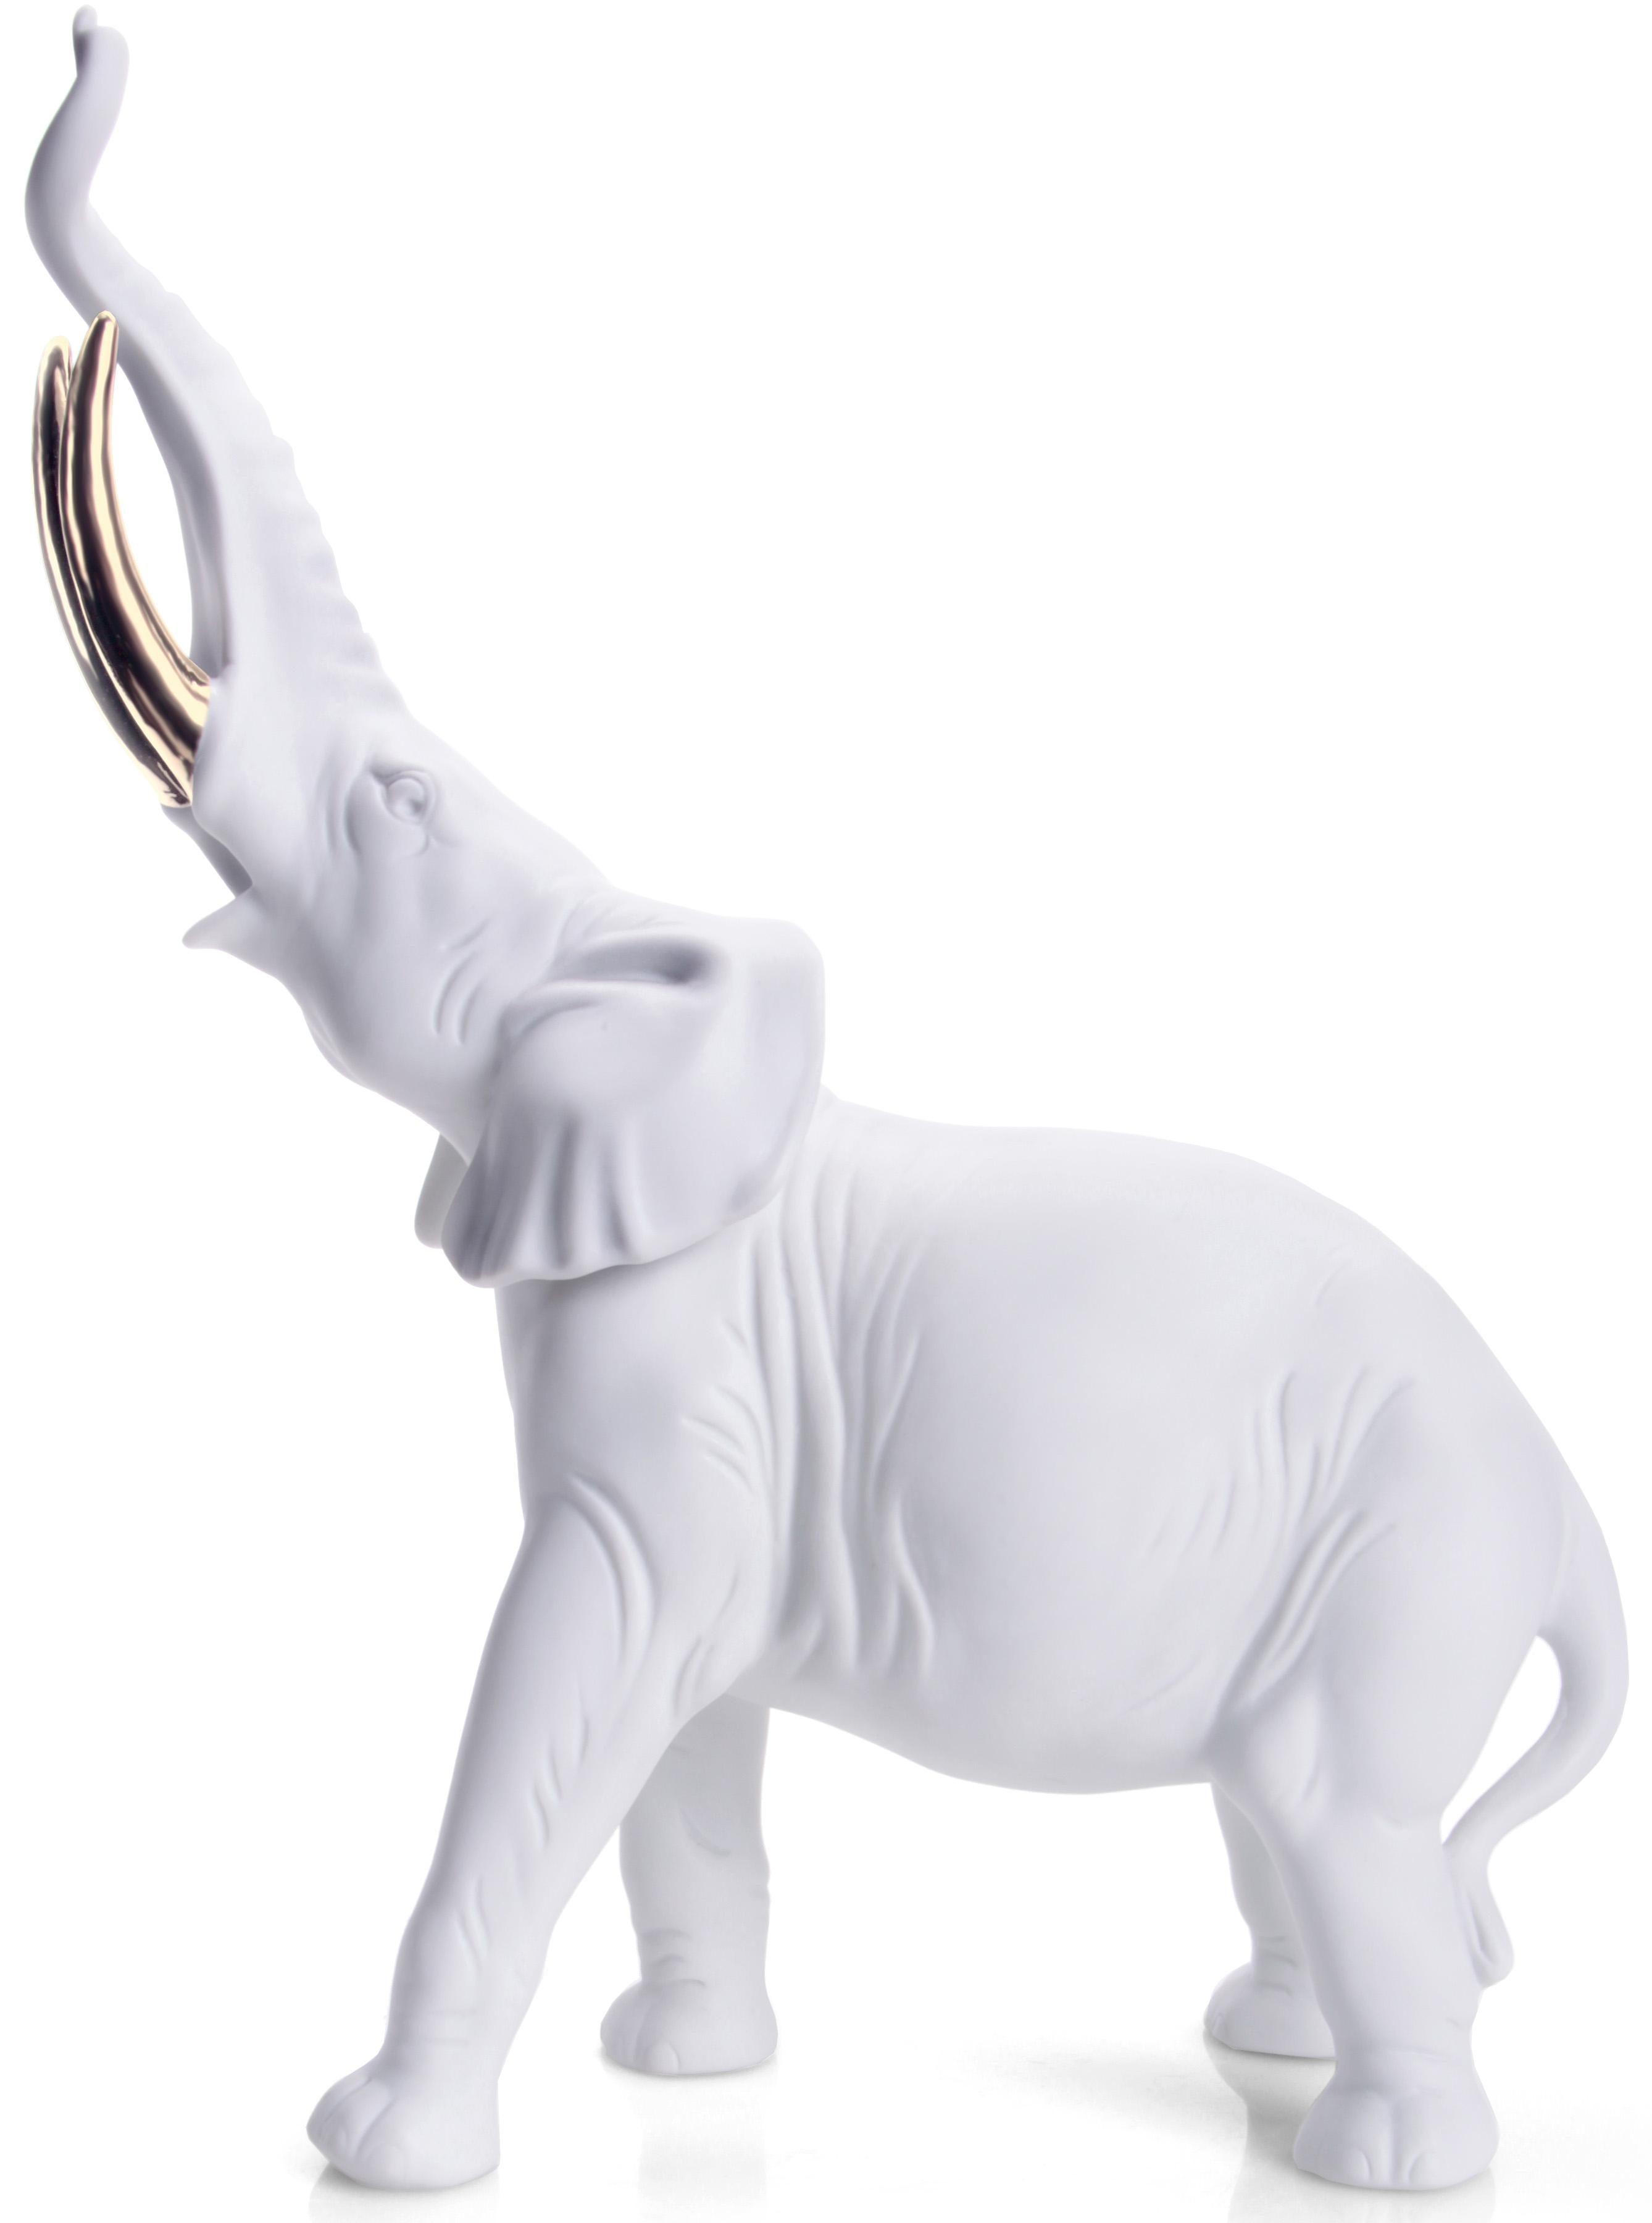 W&A Figur »Elefant« aus Porzellan